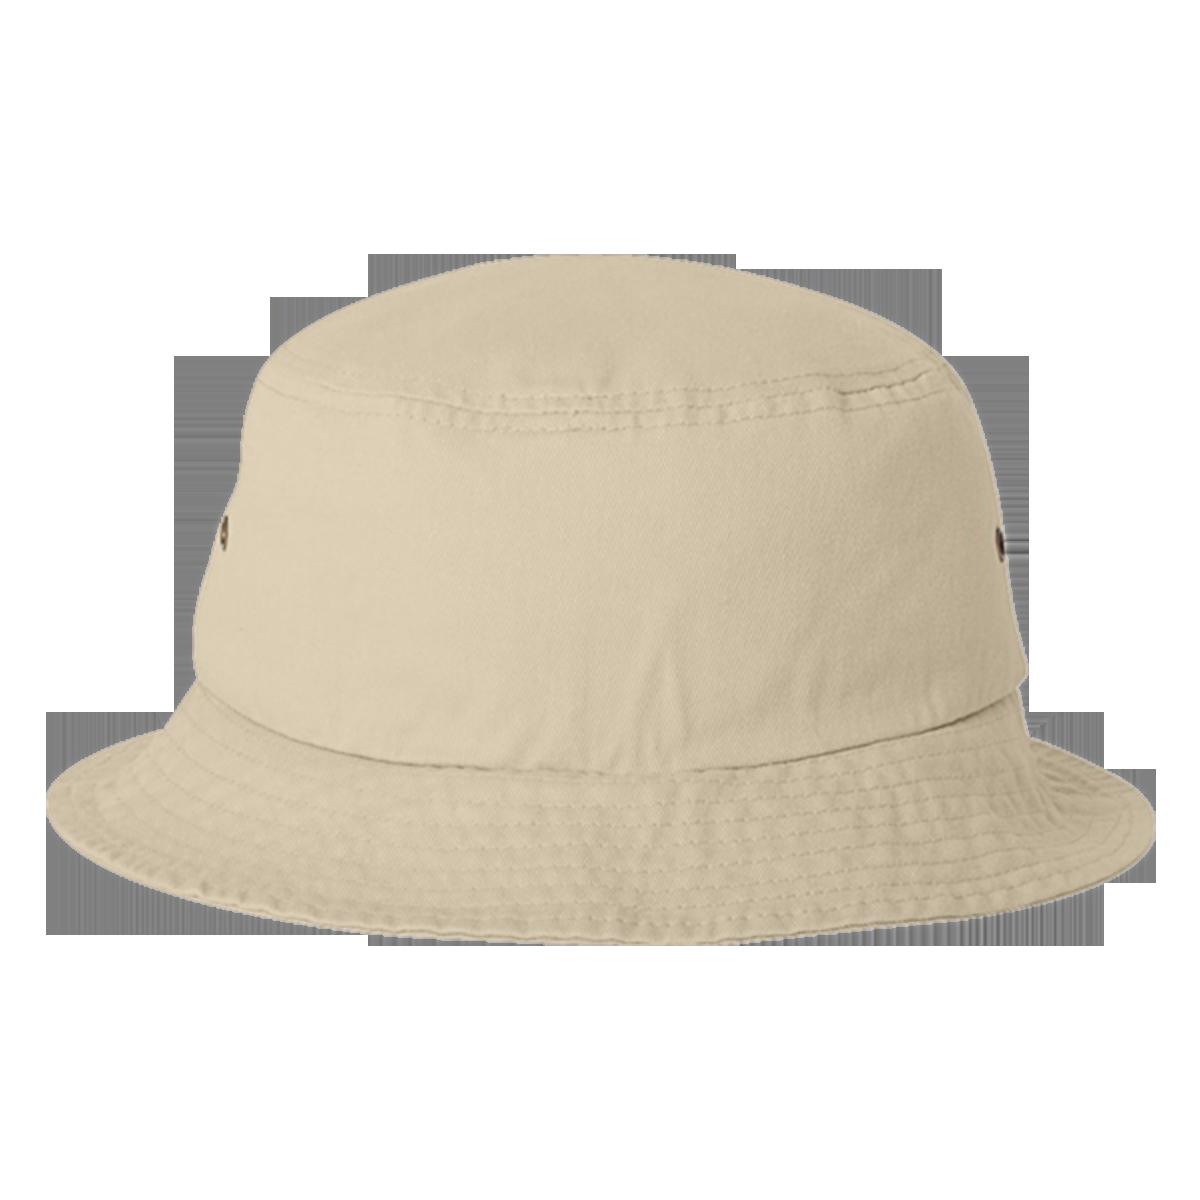 Design Your Custom Bucket Hats | Hatsline - Embroidery front